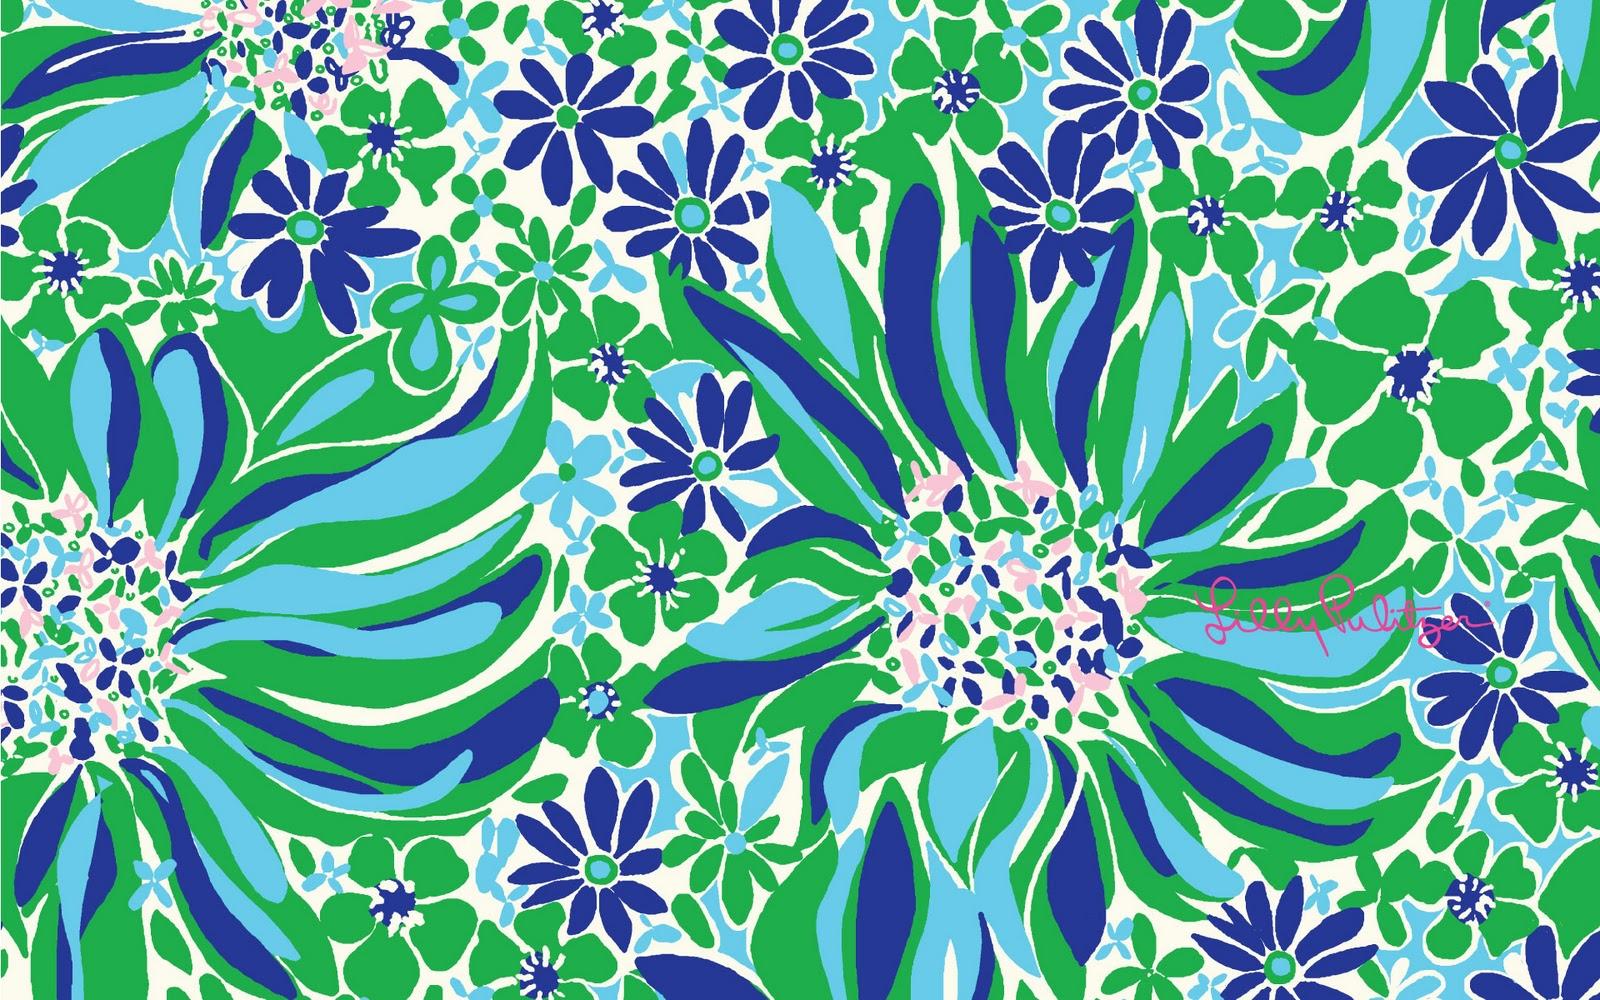 CanadianPrep-Lilly-Desktop-wallpaper-wp5002566